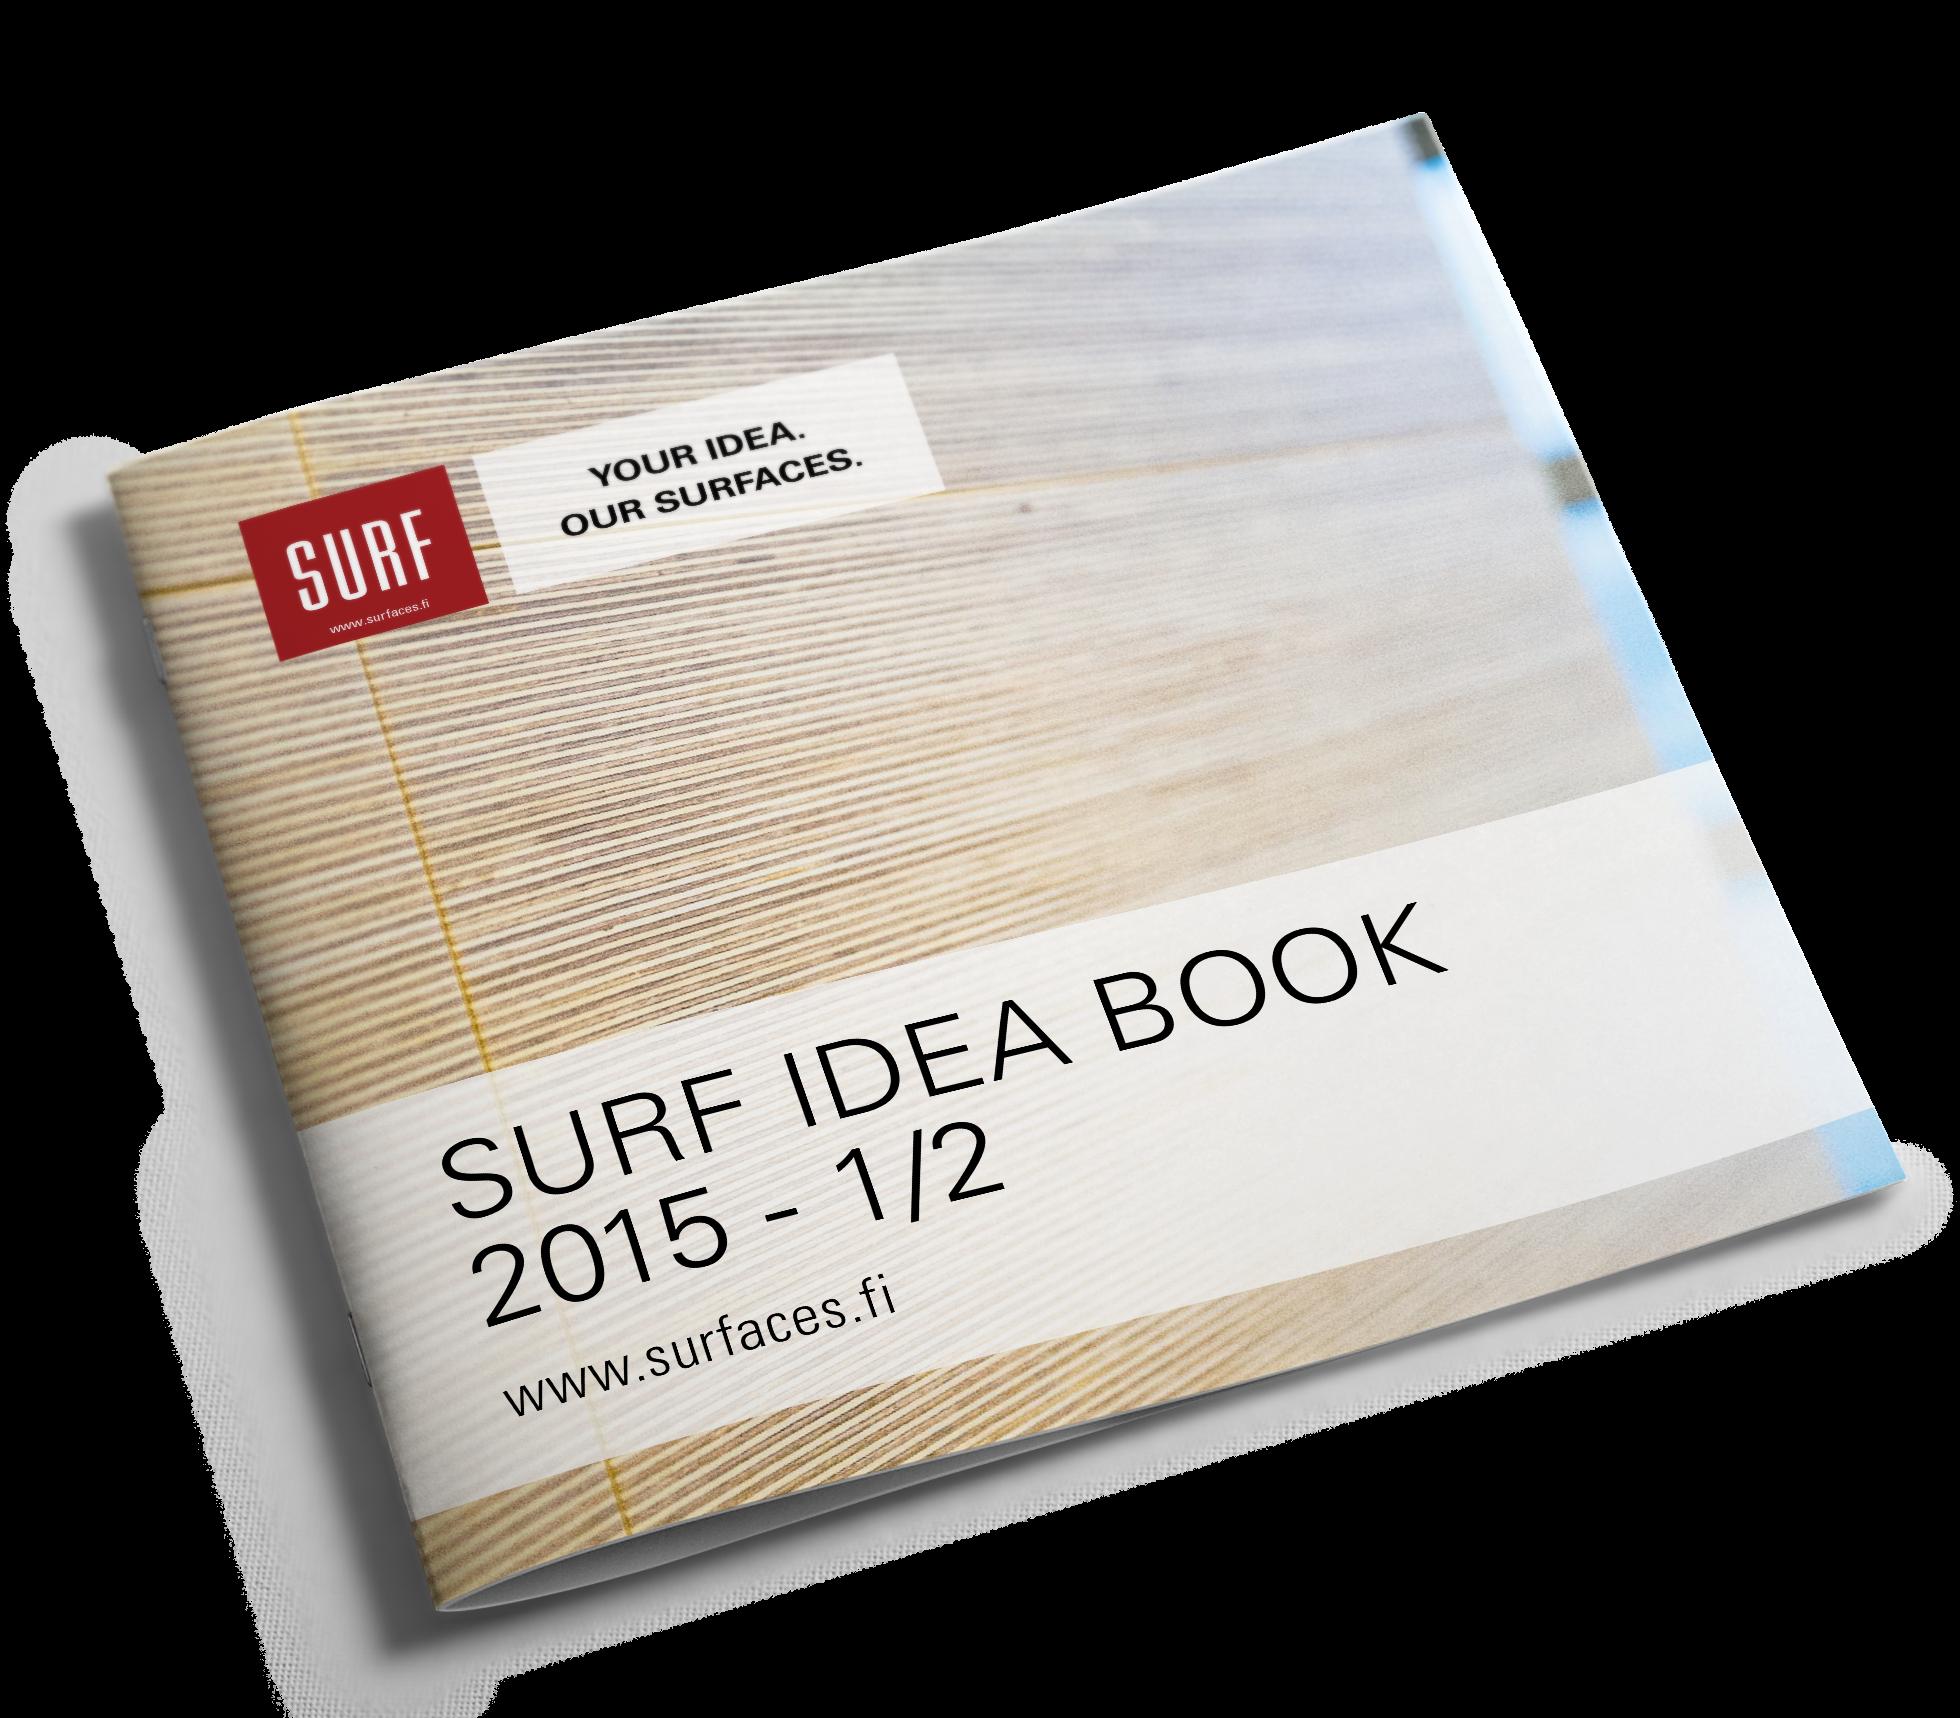 SURF Idea Book 2015 - 1/2